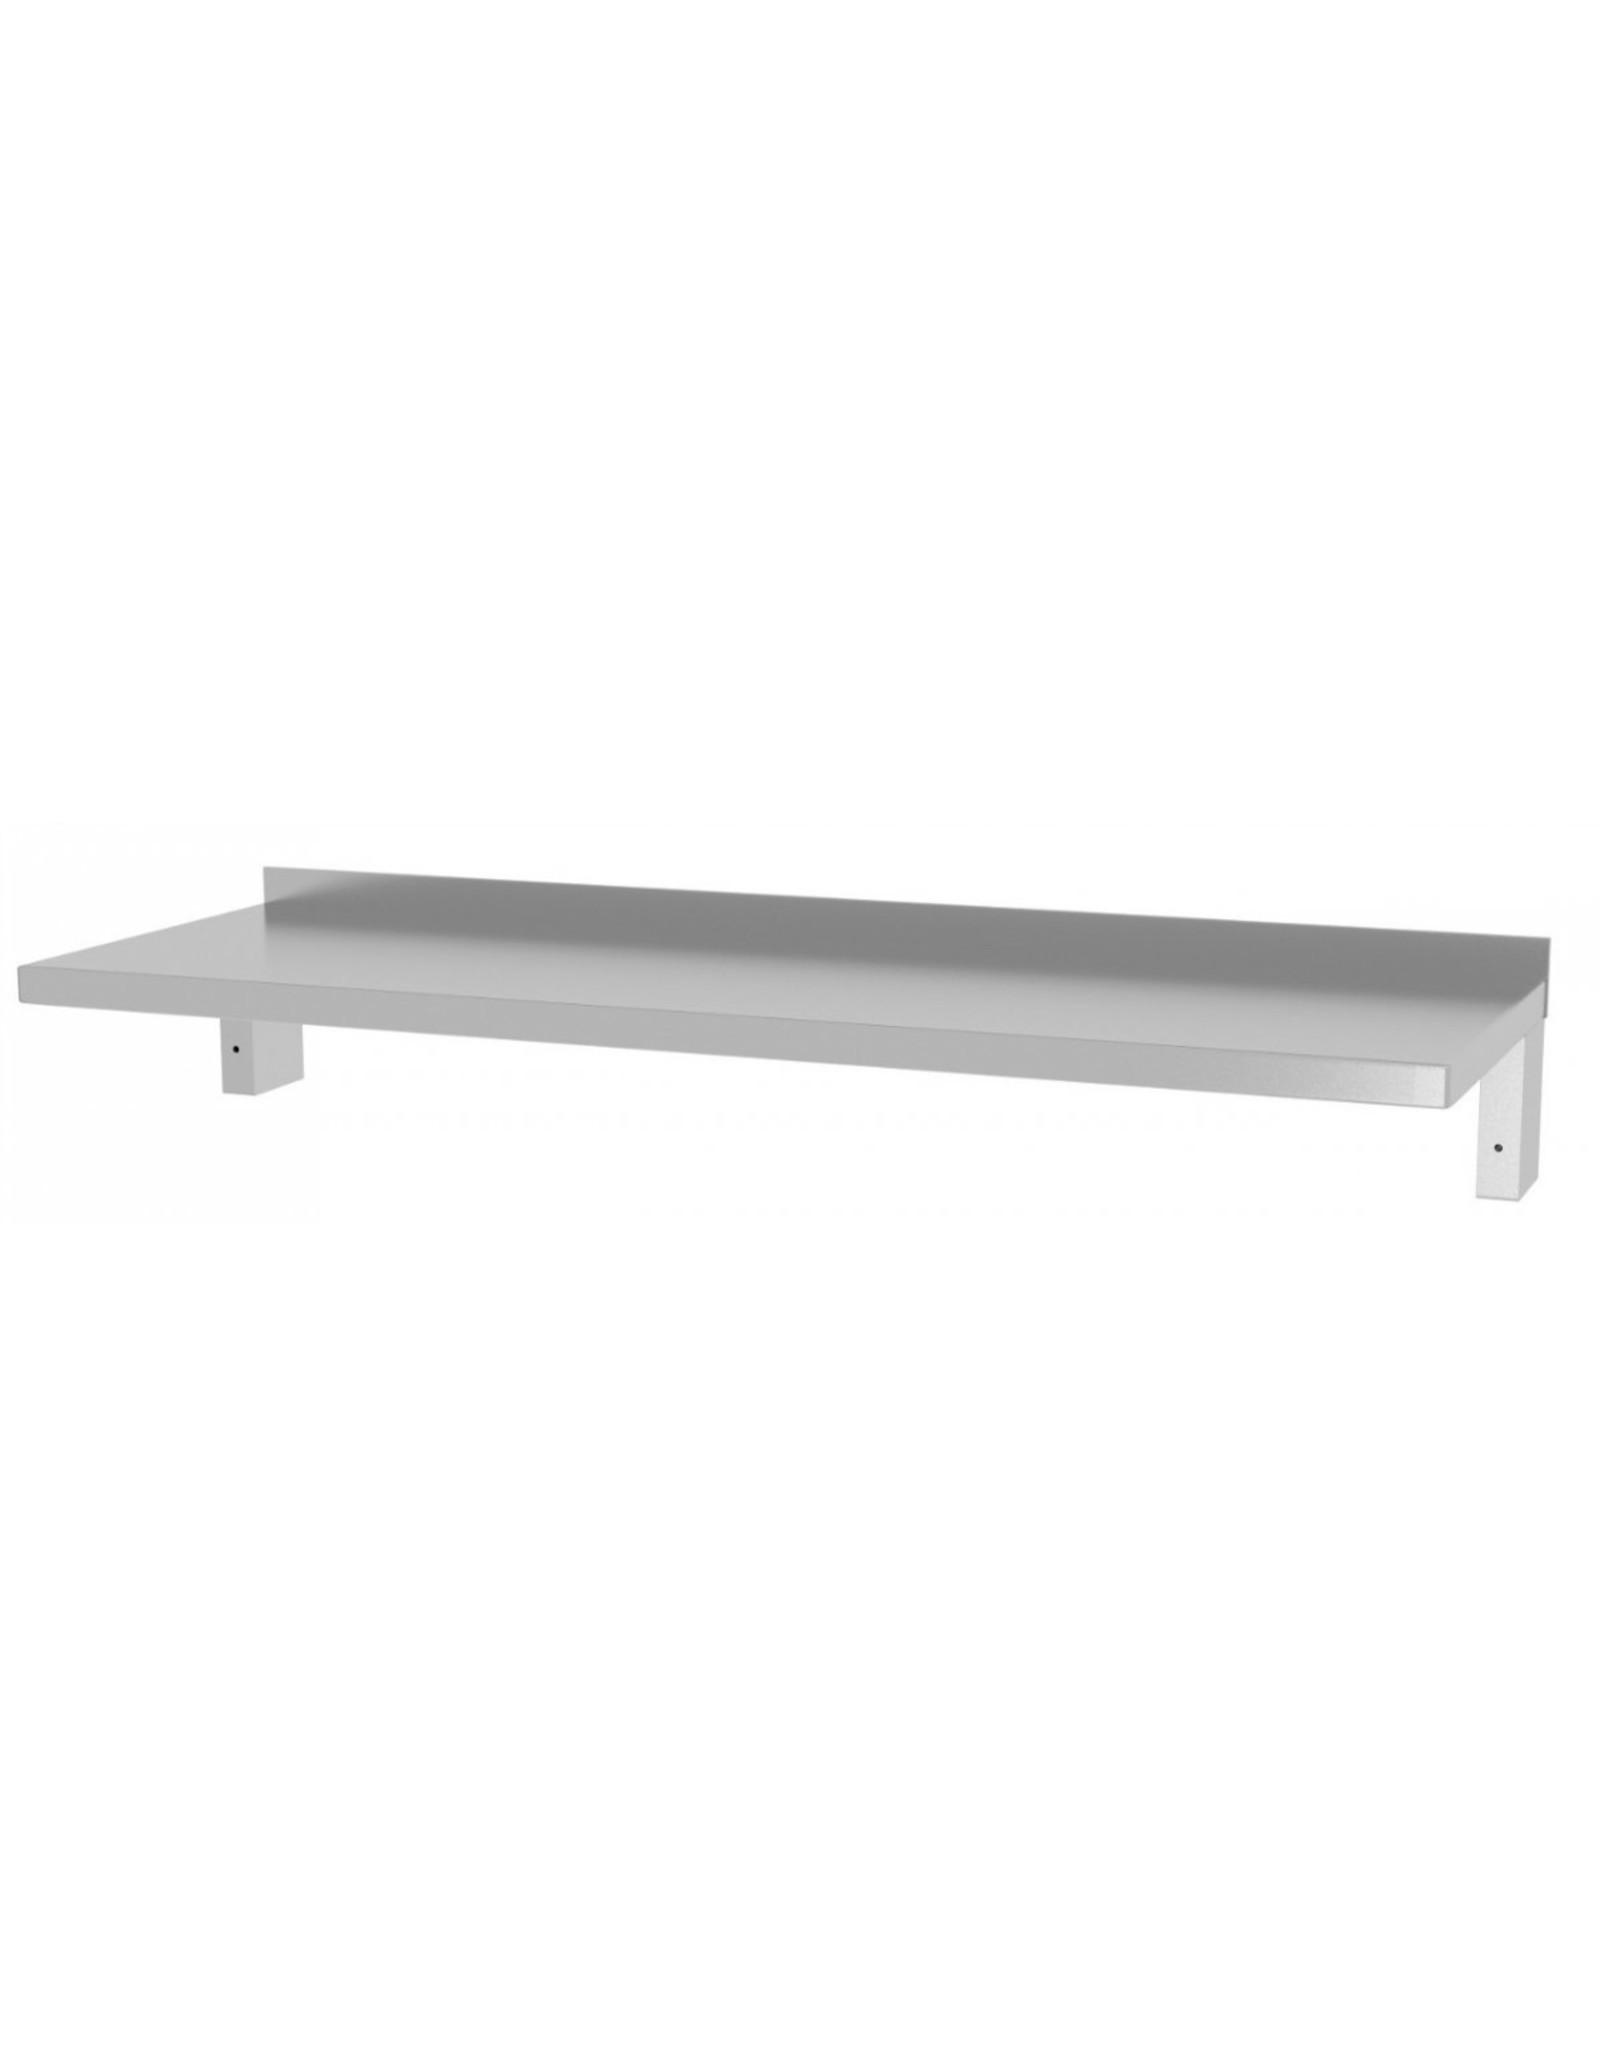 Wandplank verstevigd vast model | met 2 beugels | 600-1500mm breed | 300 of 400mm diep